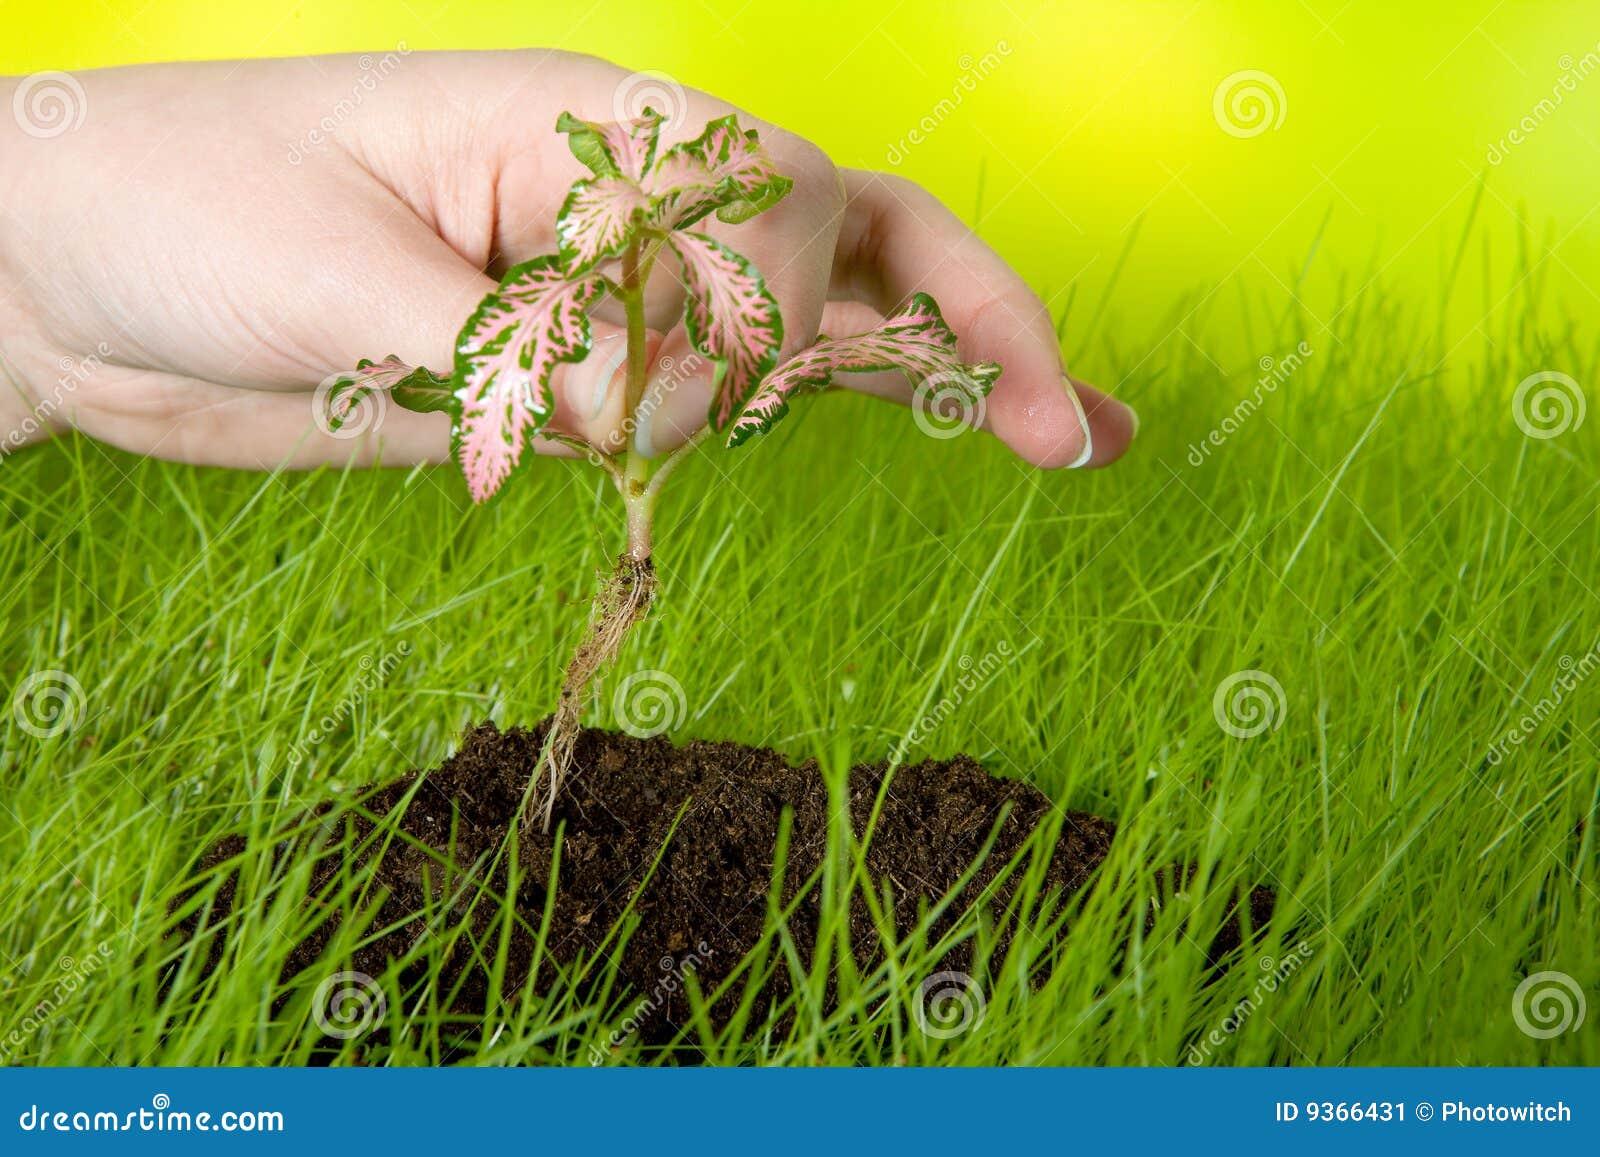 Plantation d 39 une plante image stock image 9366431 for Plante 5 doigts bahamas